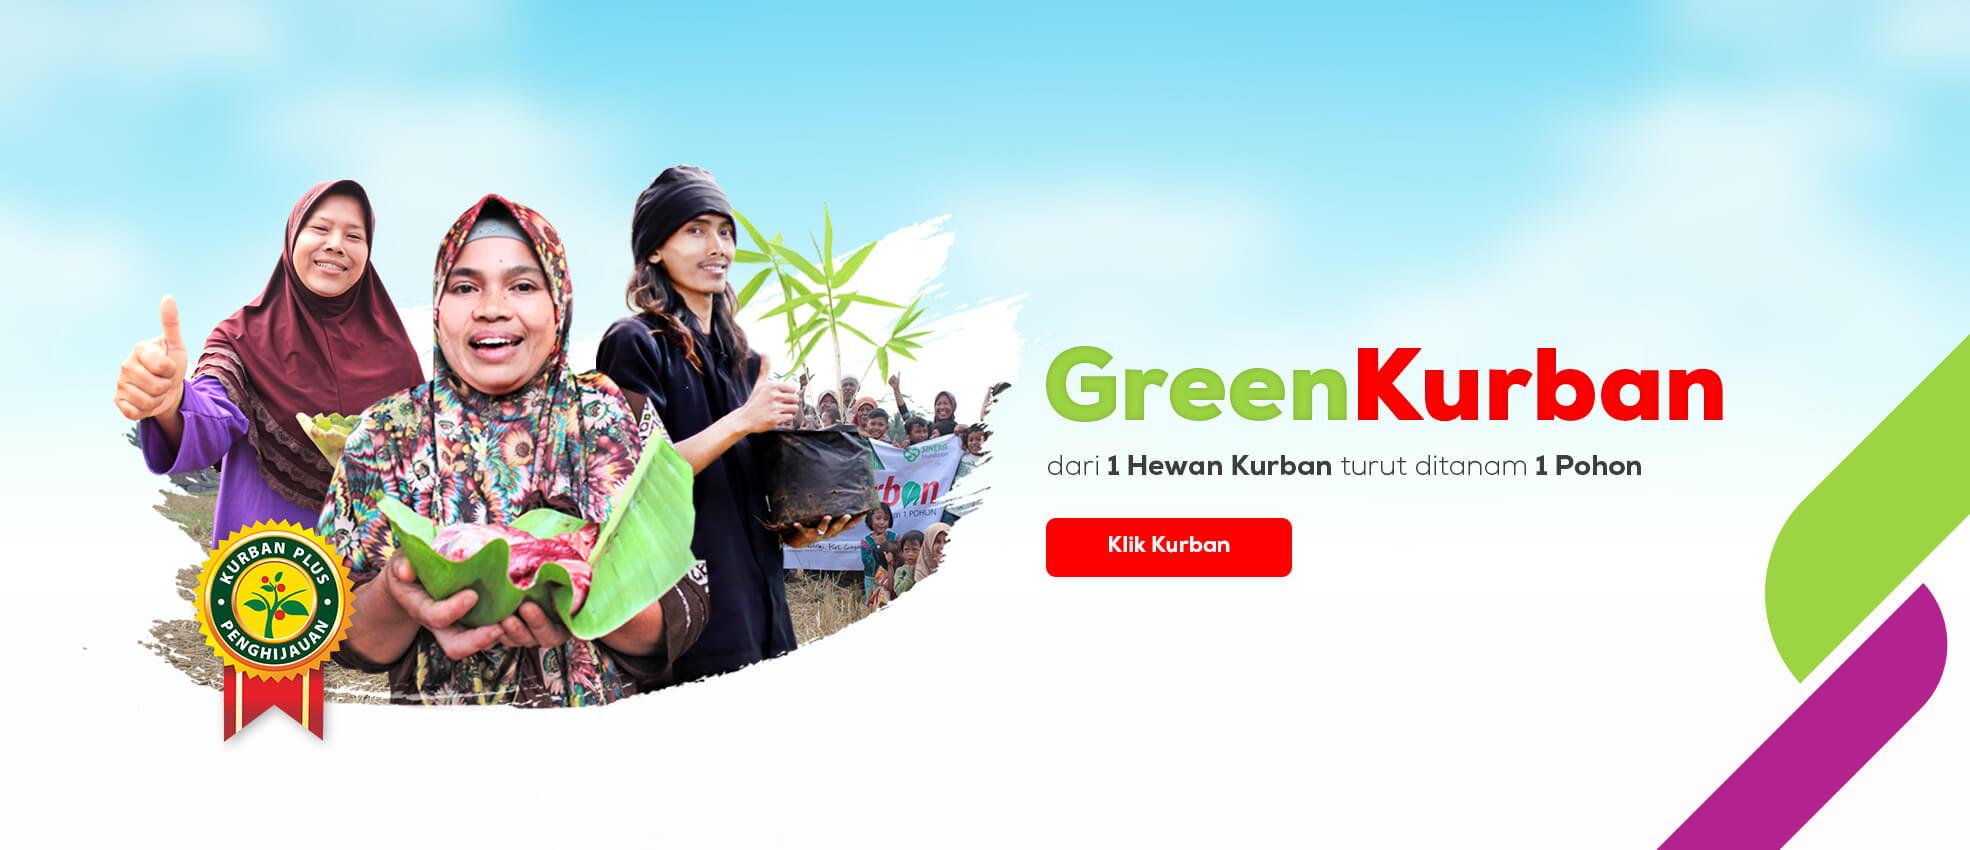 green kurban, kurban peduli, kurban plus penghijauan